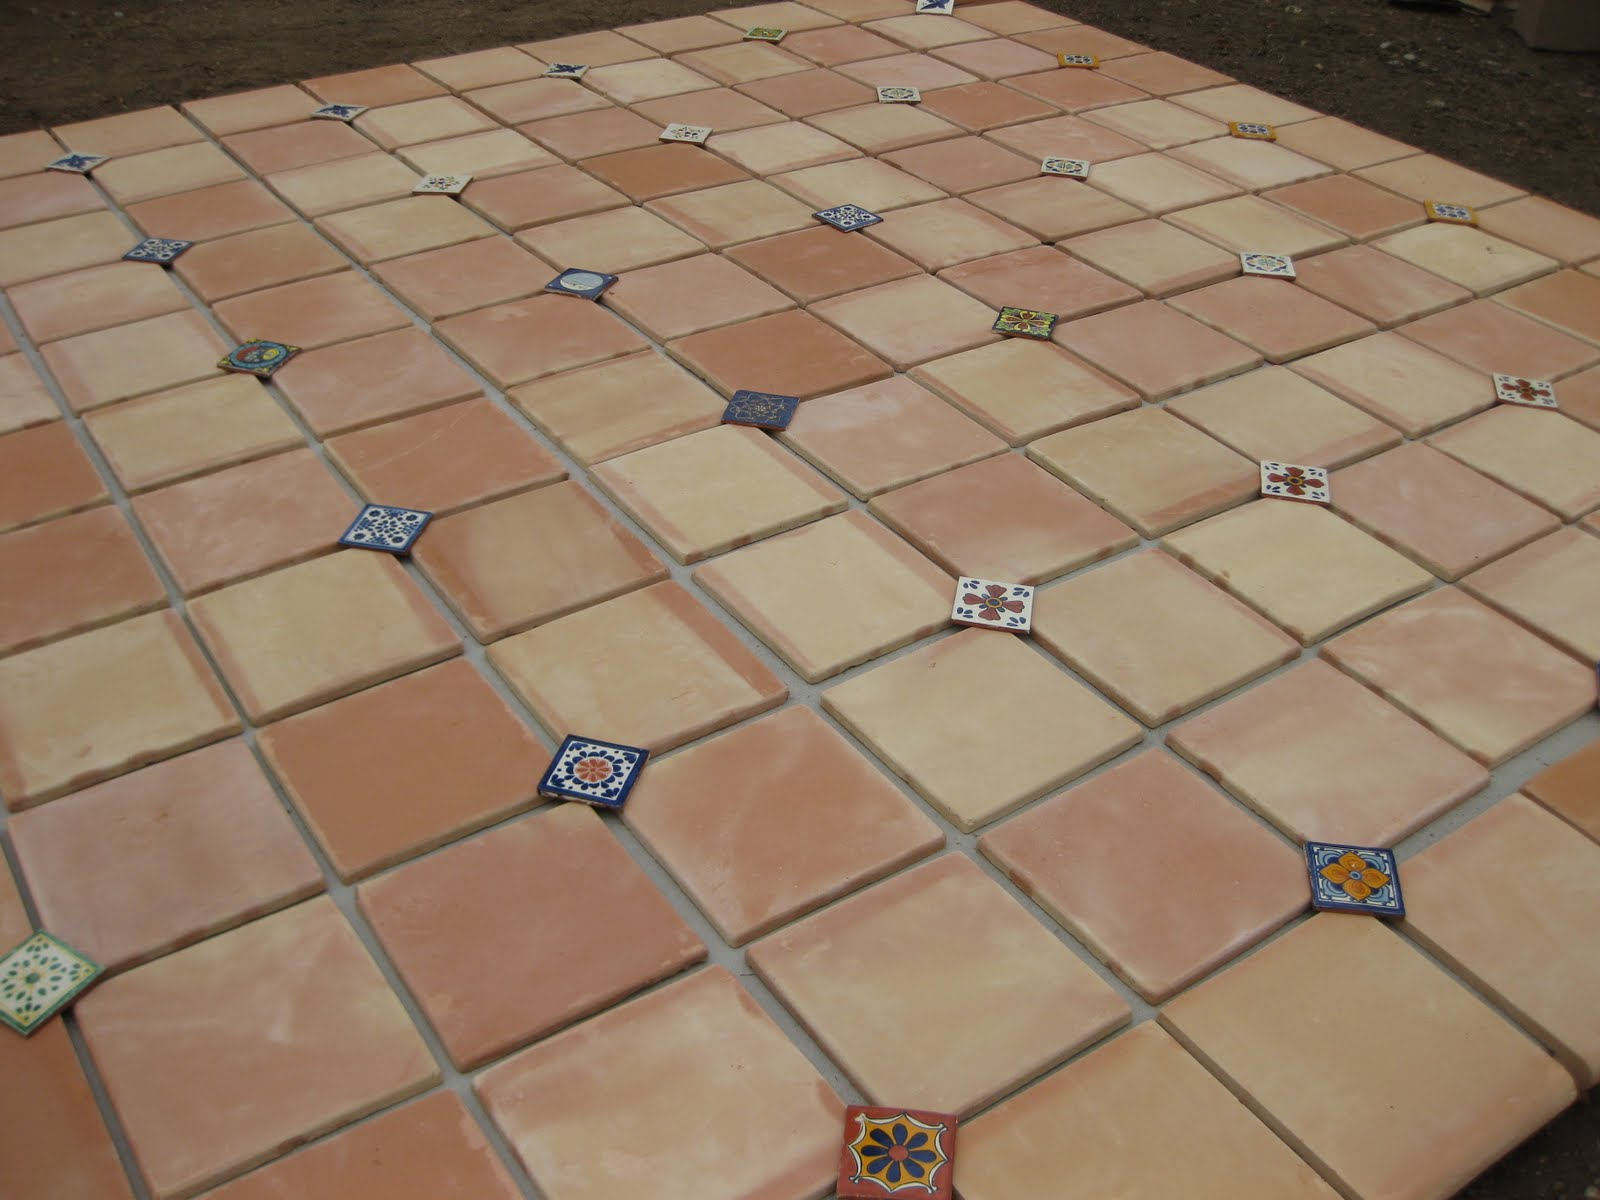 Tile Laying Patterns | Joy Studio Design Gallery - Best Design